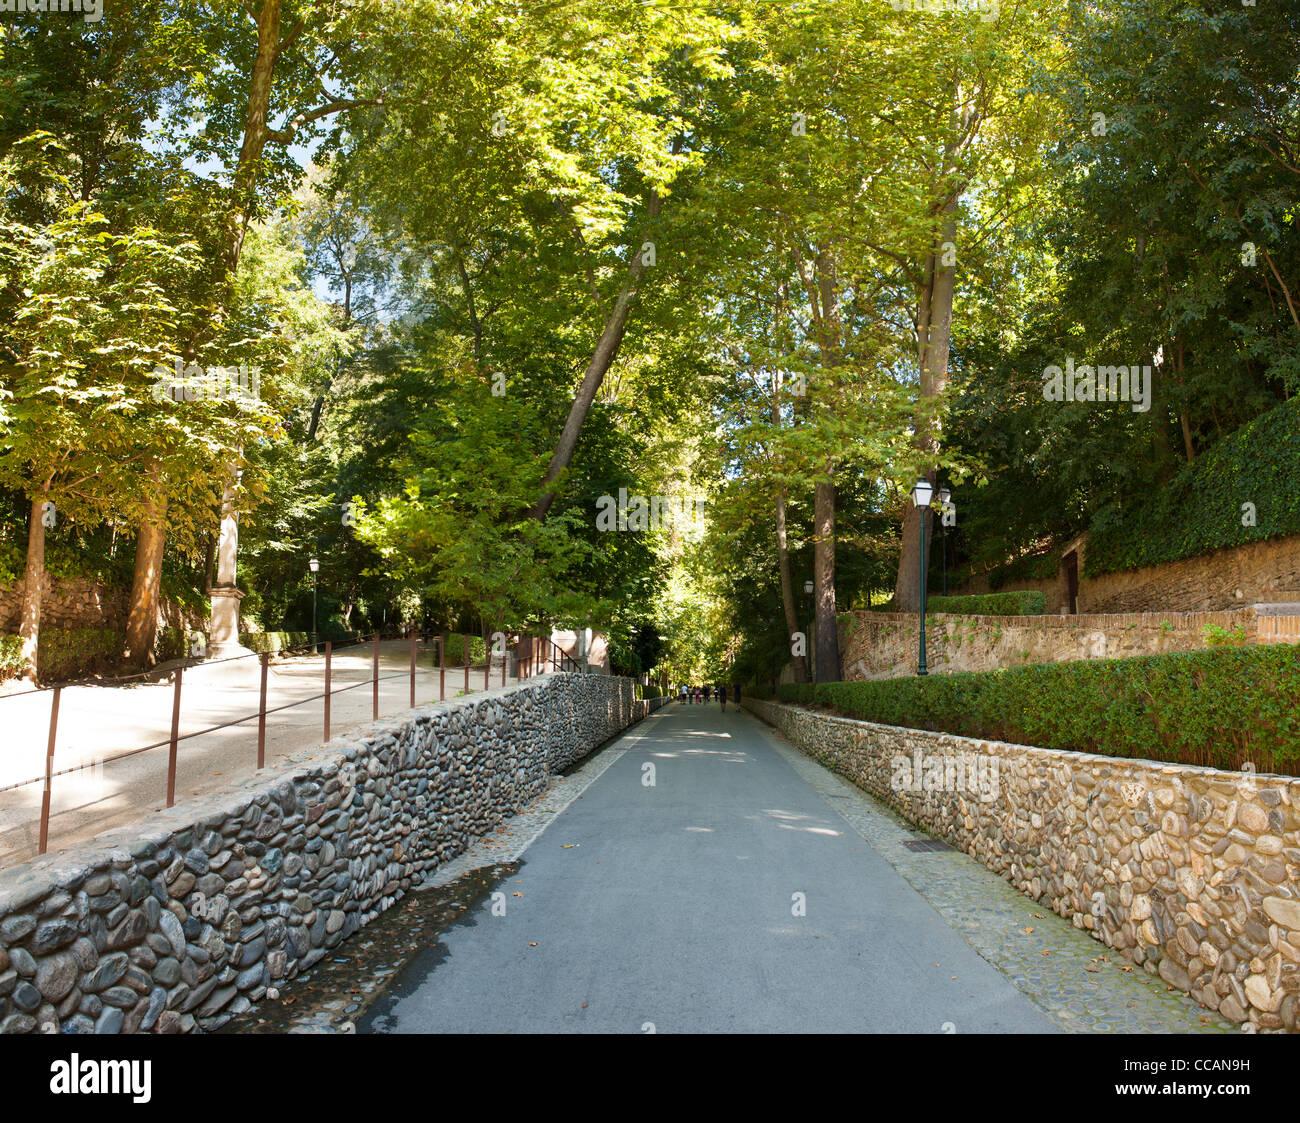 Alhambra Sage Granada Park Alhambra Ca: Path Winding Through Woodland Garden Stock Photos & Path